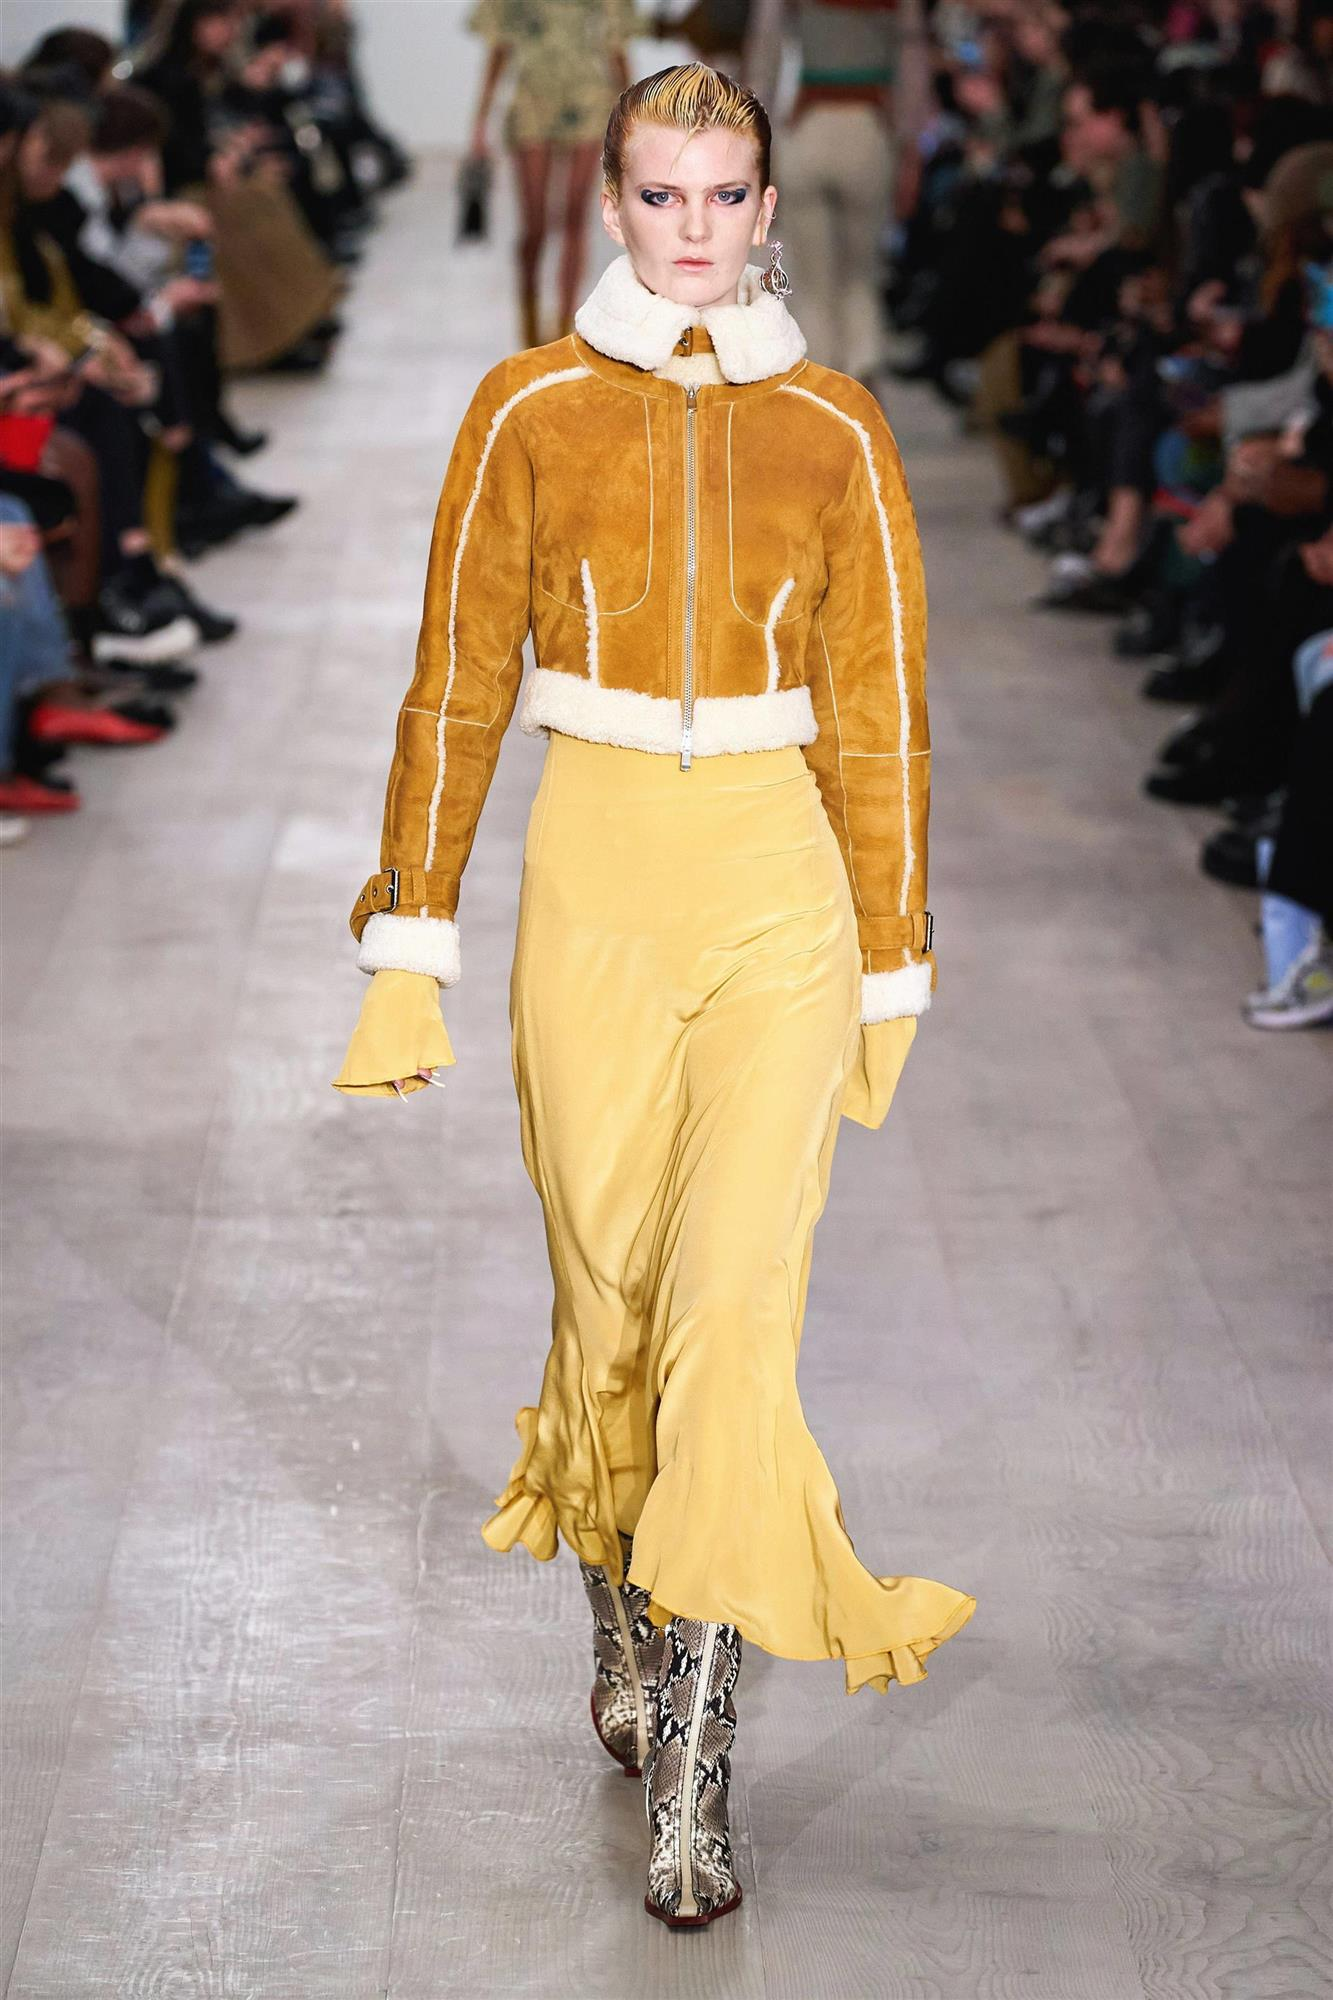 Semana de la moda de Londres, Charlotte Knowles